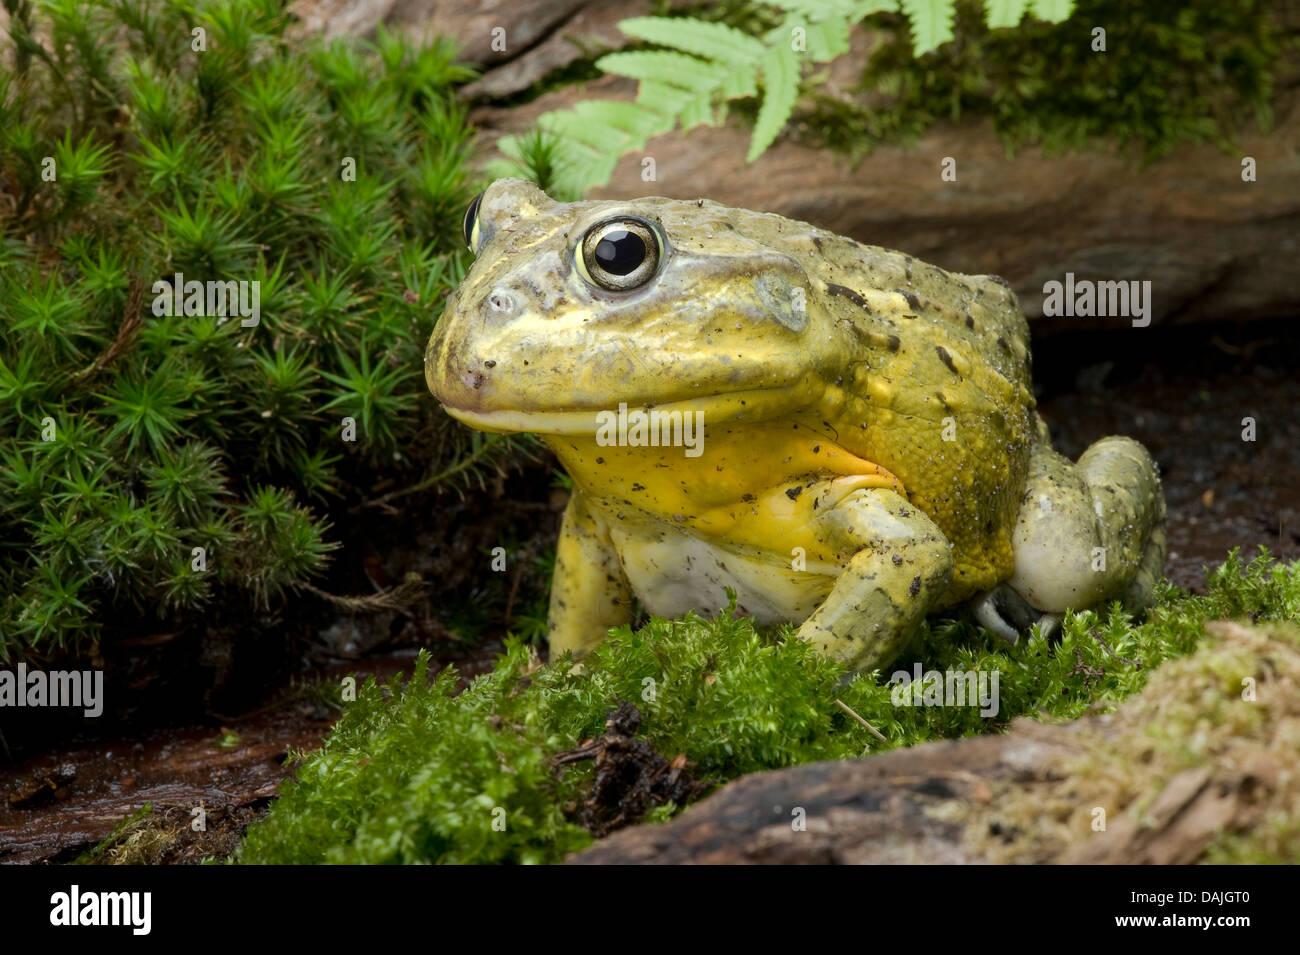 Tschudi's African bullfrog, Gaint bull frog, African Bullfrog (Pyxicephalus adspersus, Afrikanischer Grabfrosch), - Stock Image